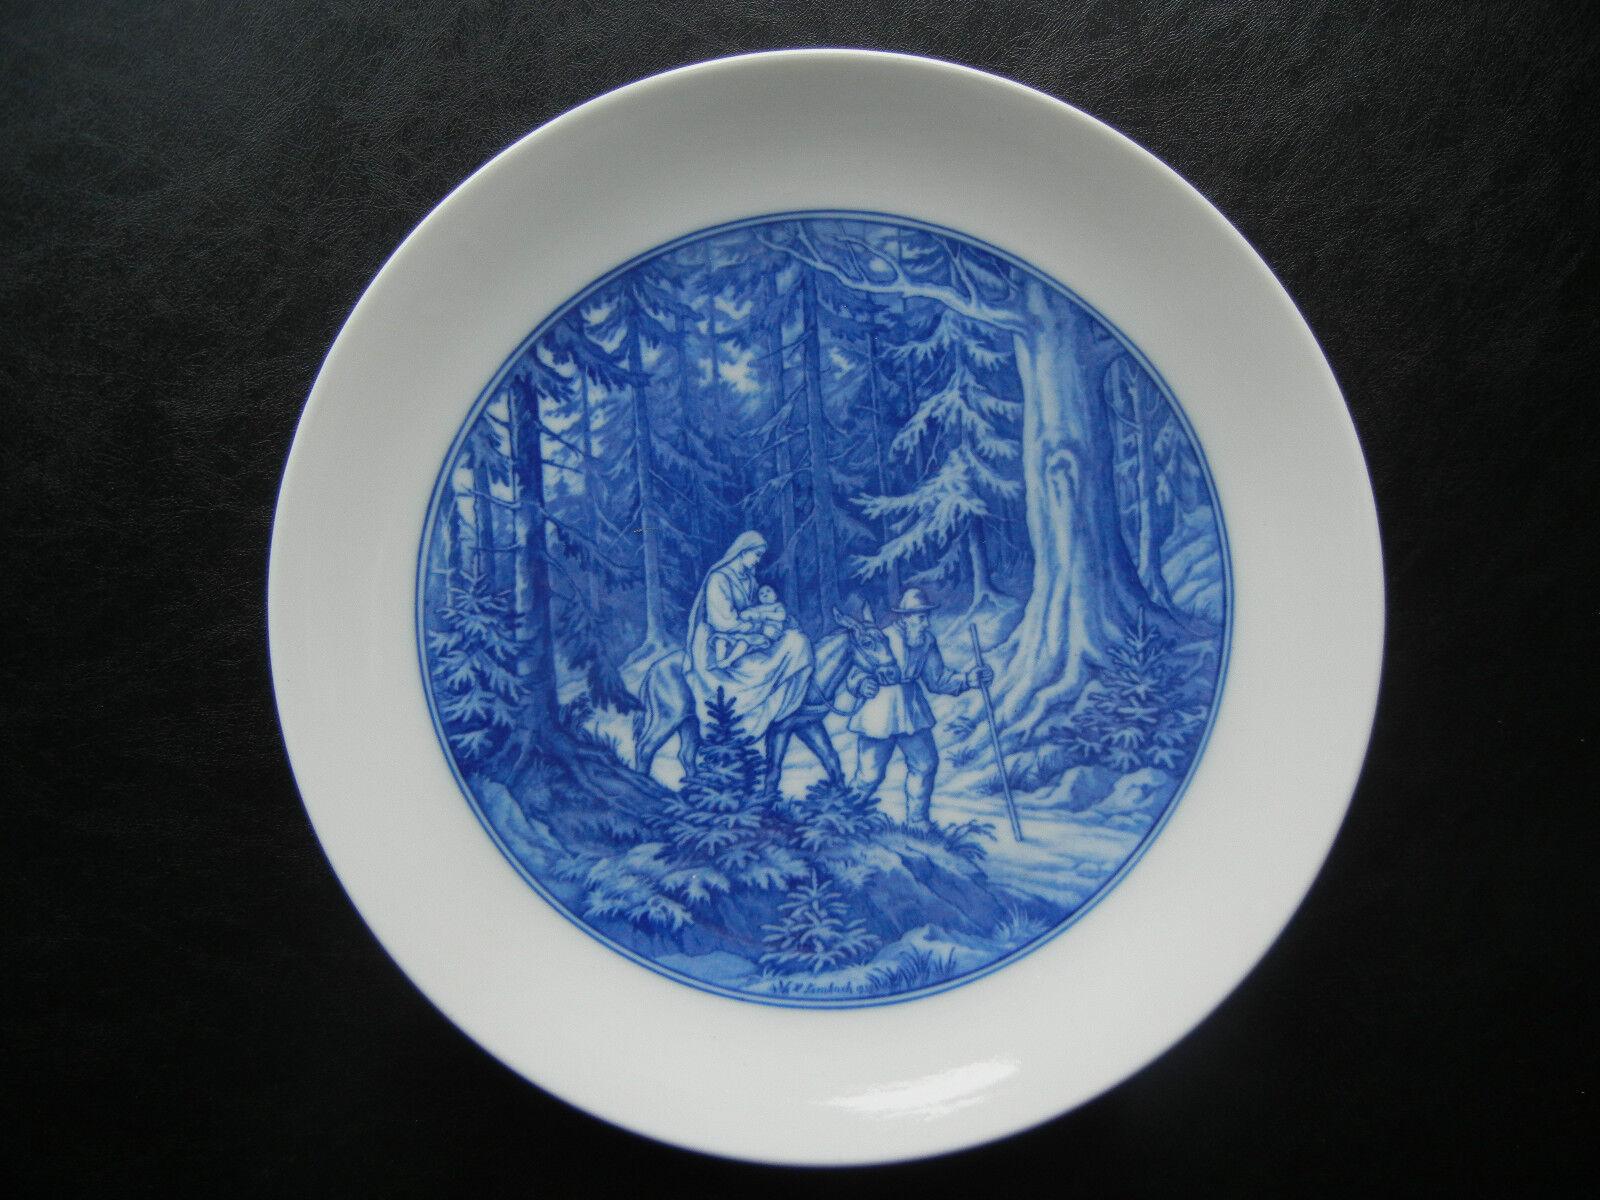 Meissen platos de parouge 1939 Sagrada Familia En La huída Al. Limbach (Mi nr. 4)